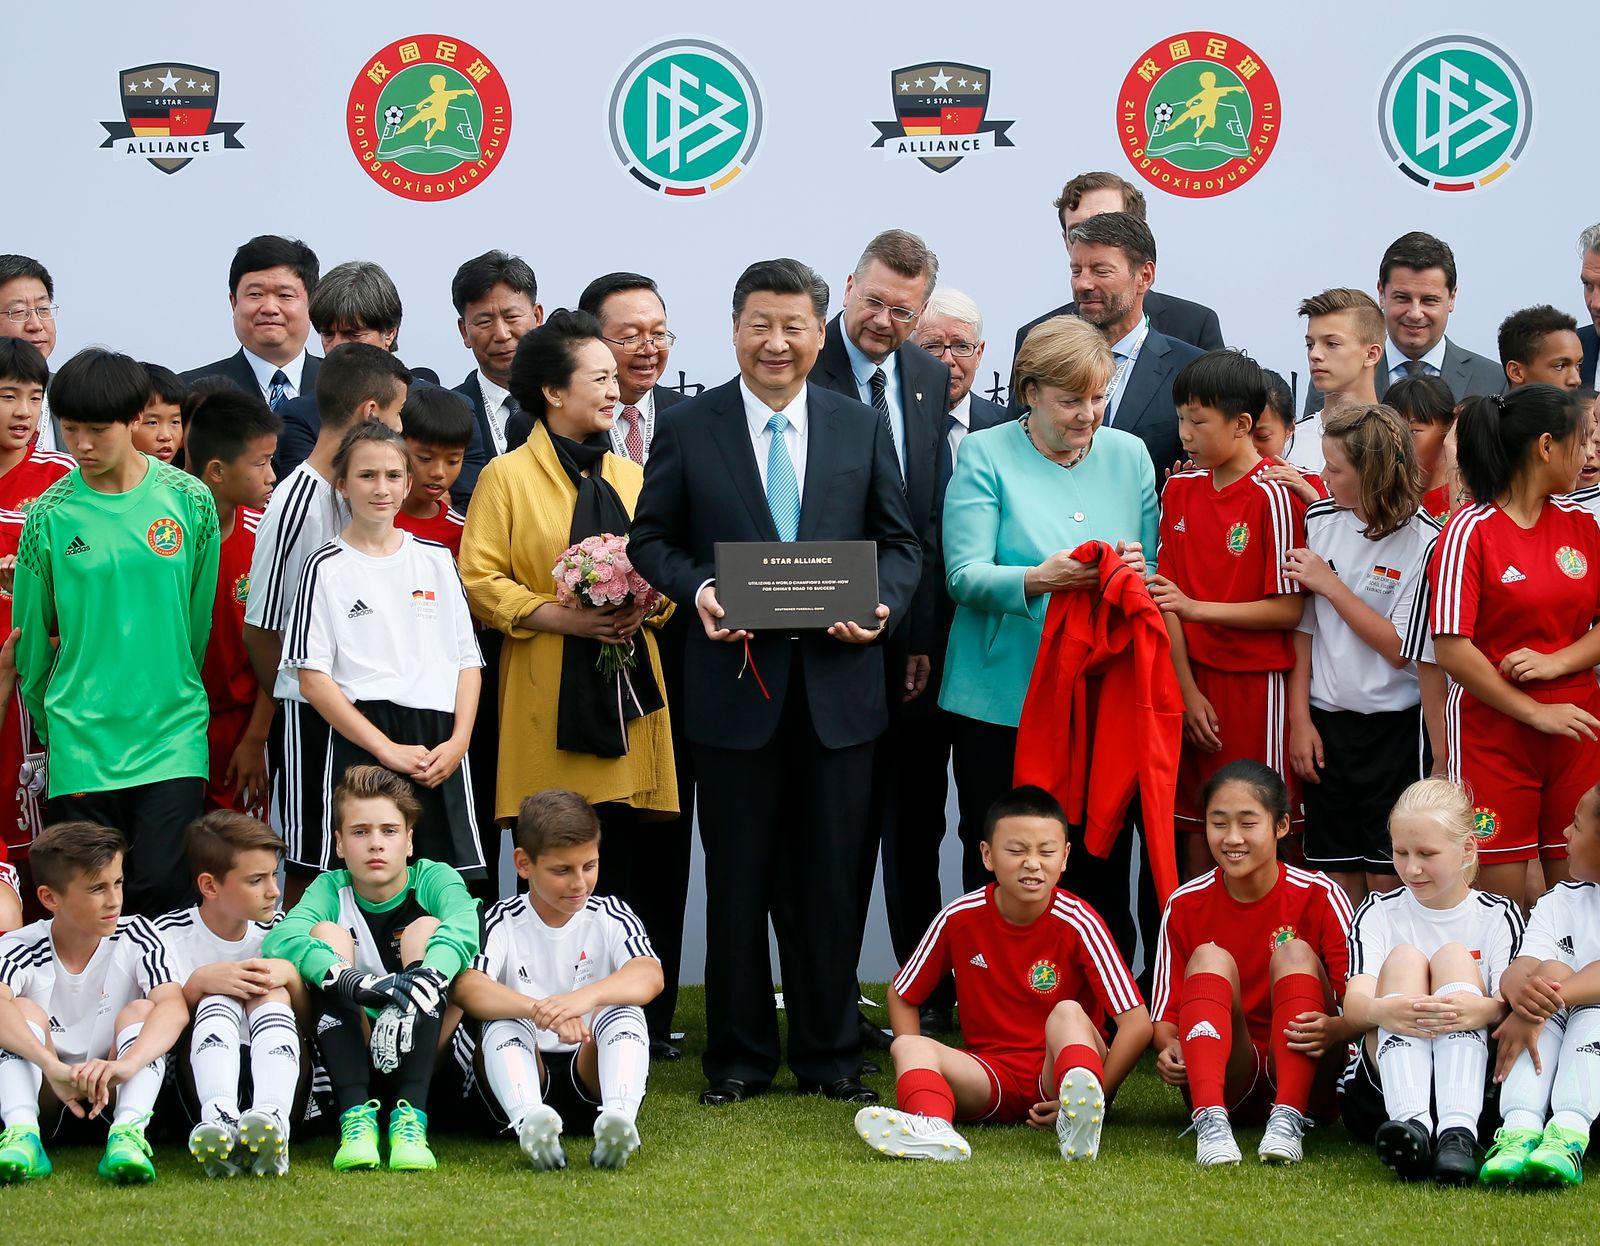 Xi Jinping, Merkel, Rorsted, Löw und co